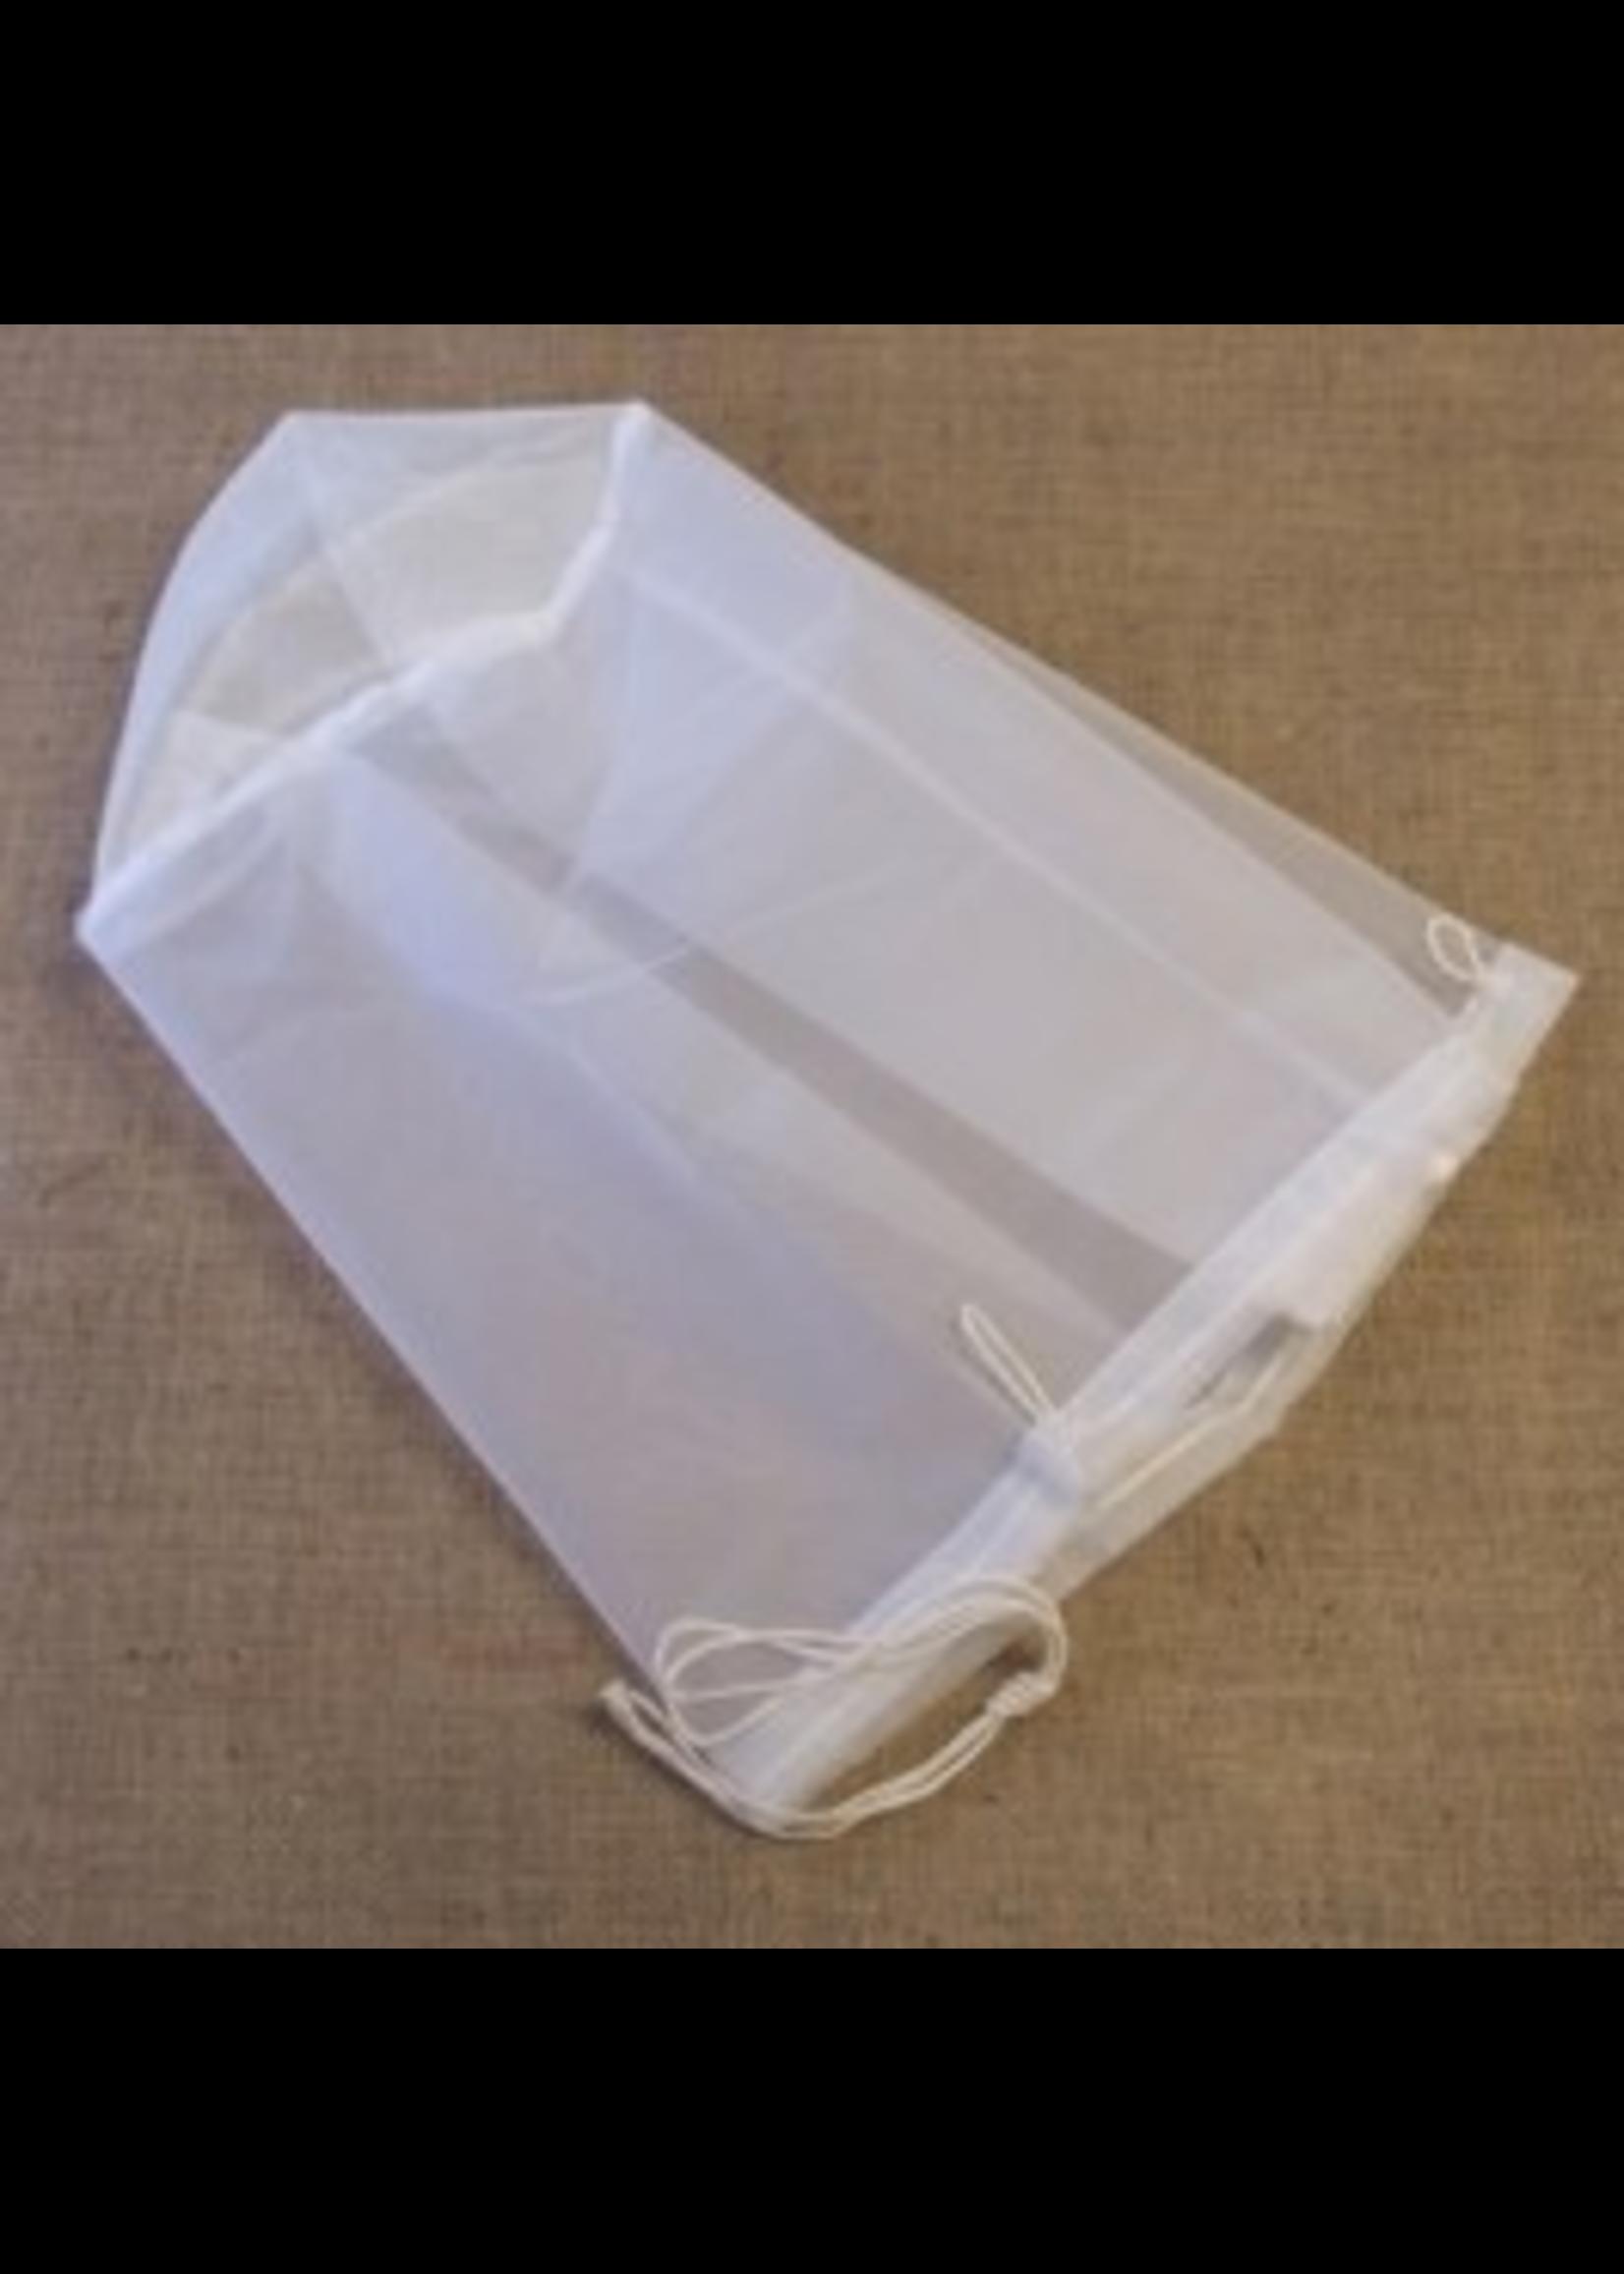 Brewing Straining Bag, Nylon - Draw String, 6.5 Gal Buckets (12 x 12)